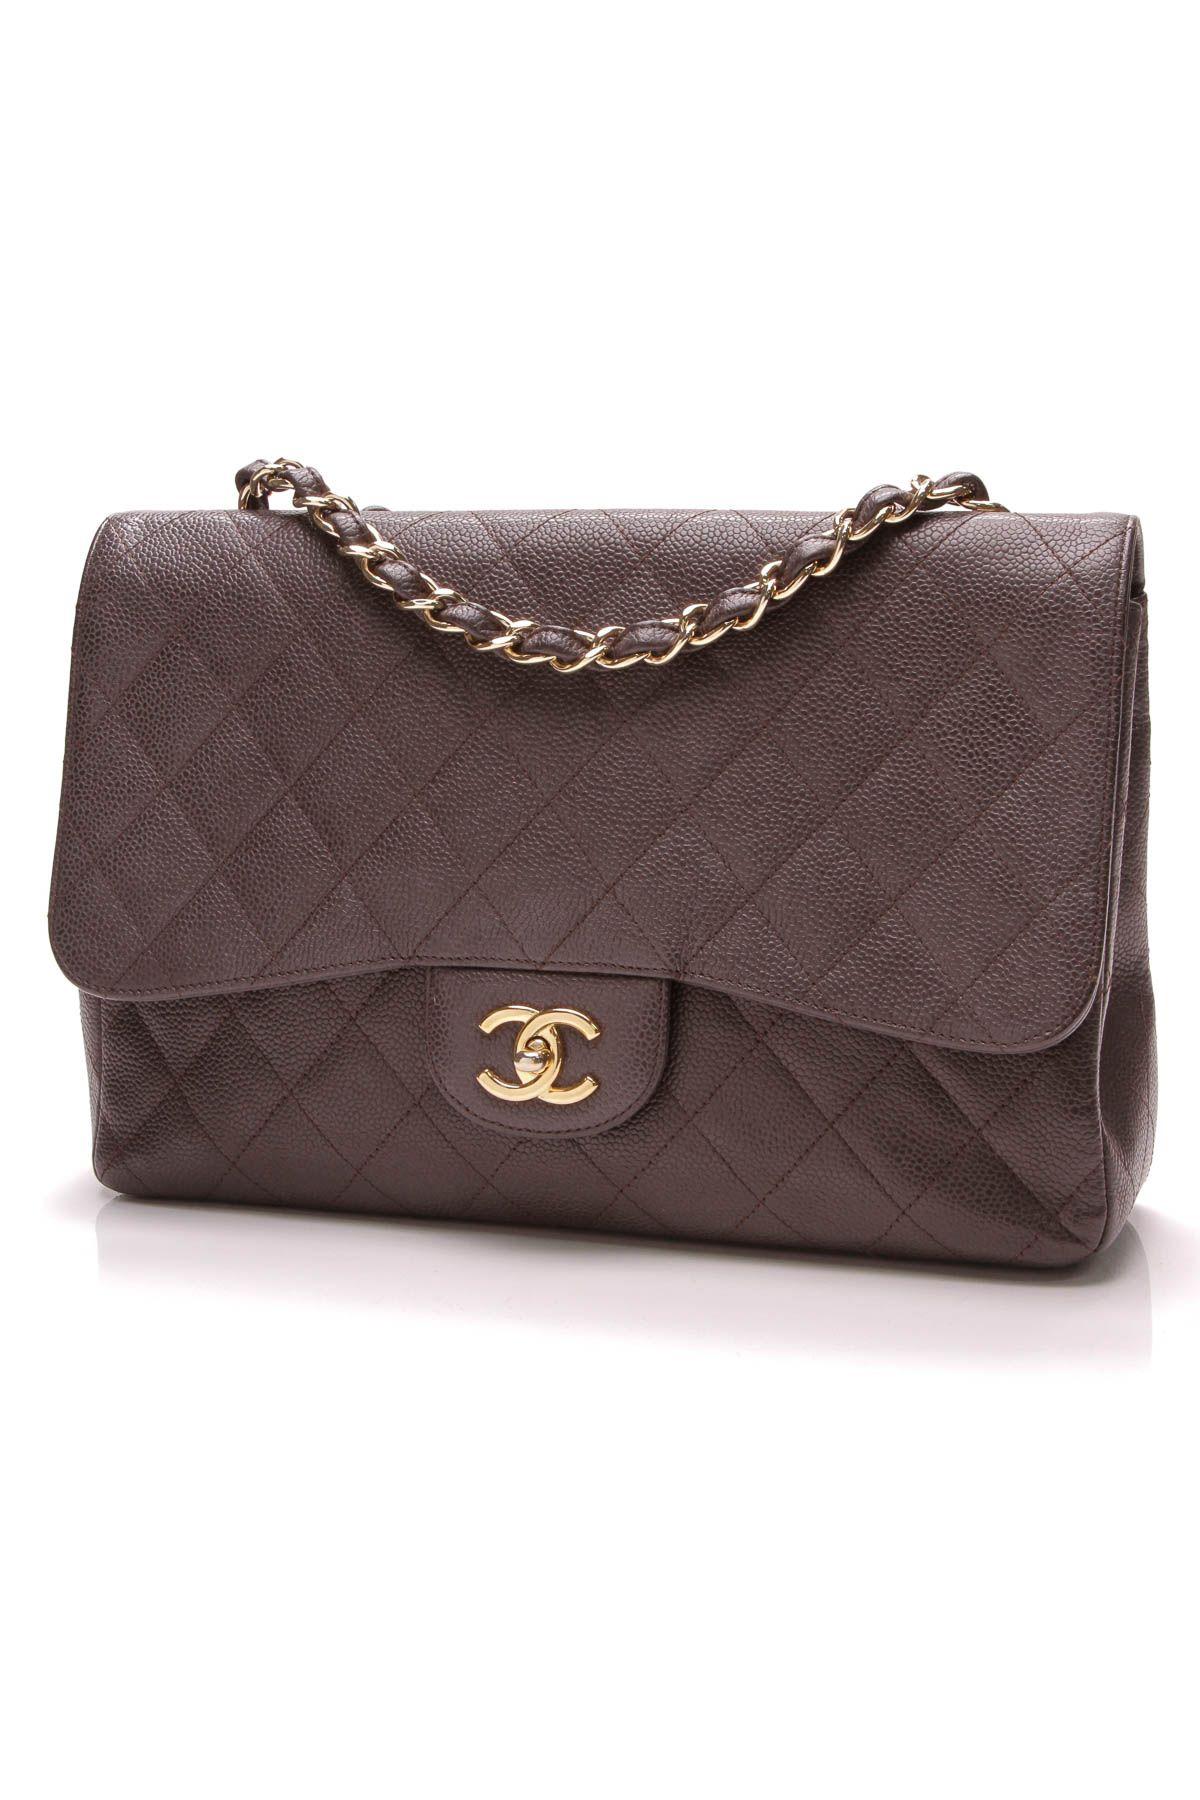 939909f04c0 Chanel Classic Flap Bag - Jumbo Brown Caviar | Fall Into Place ...